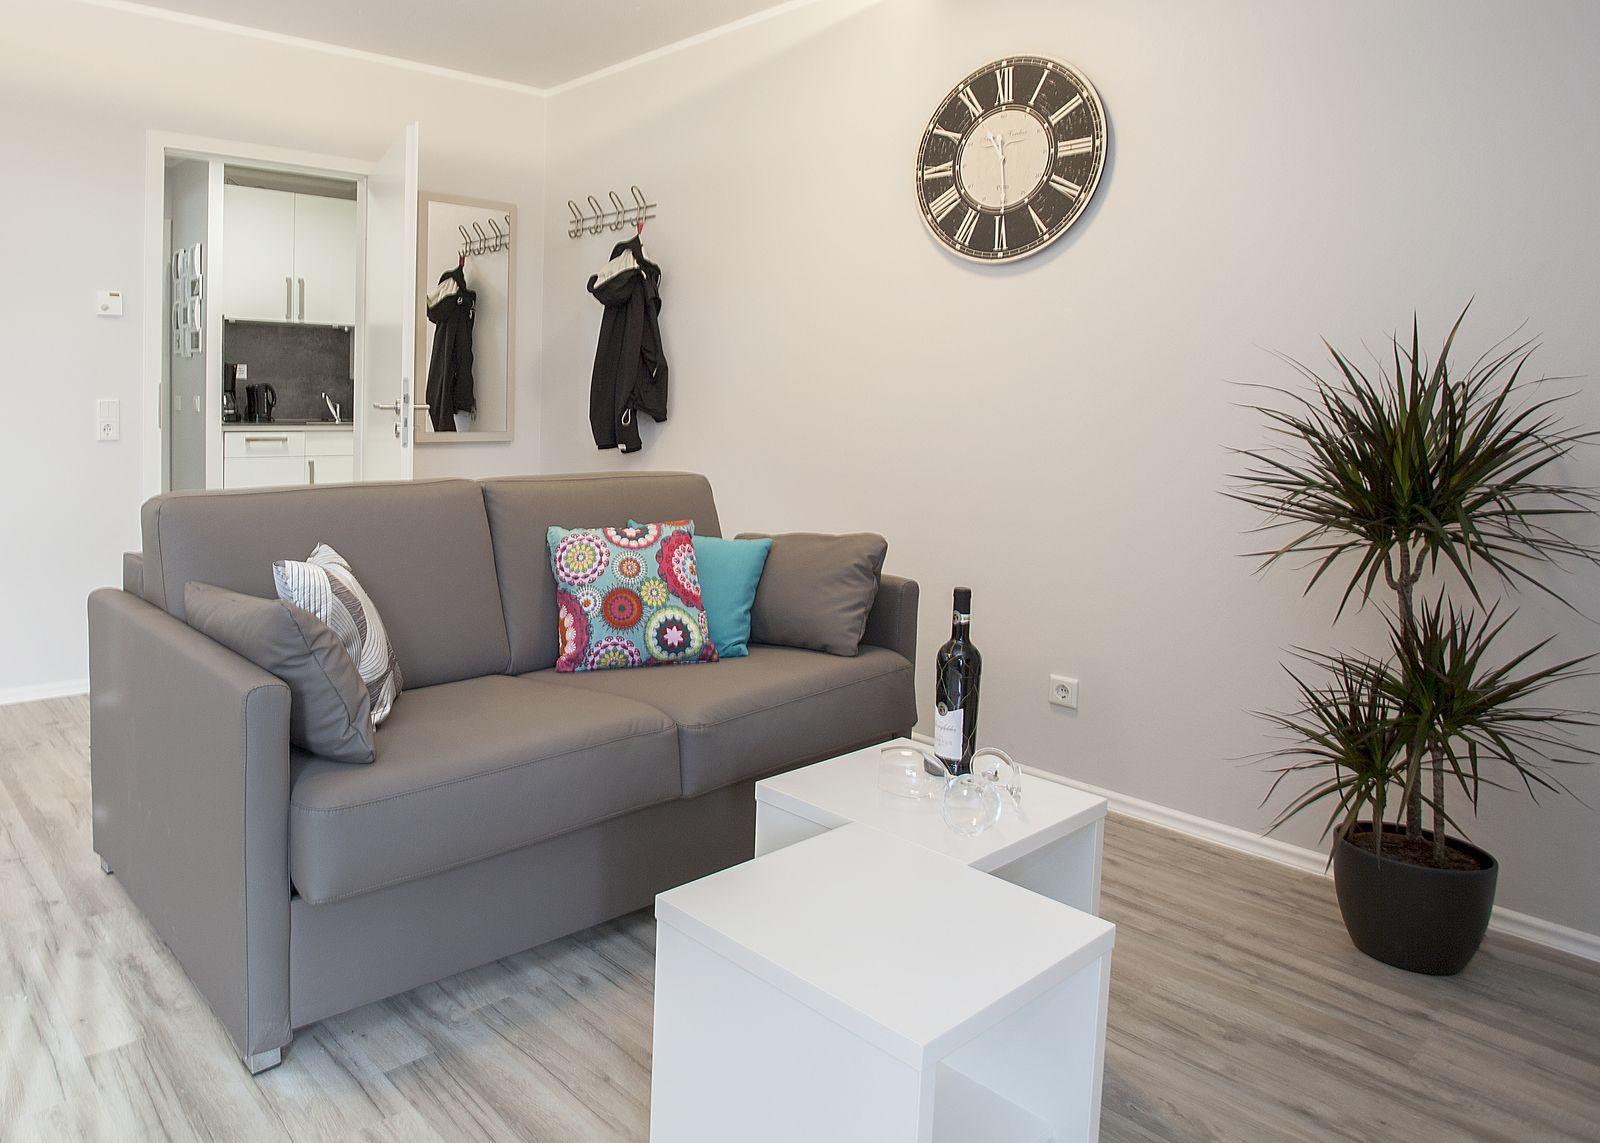 Appartement - Komfort 4 Personen(z)